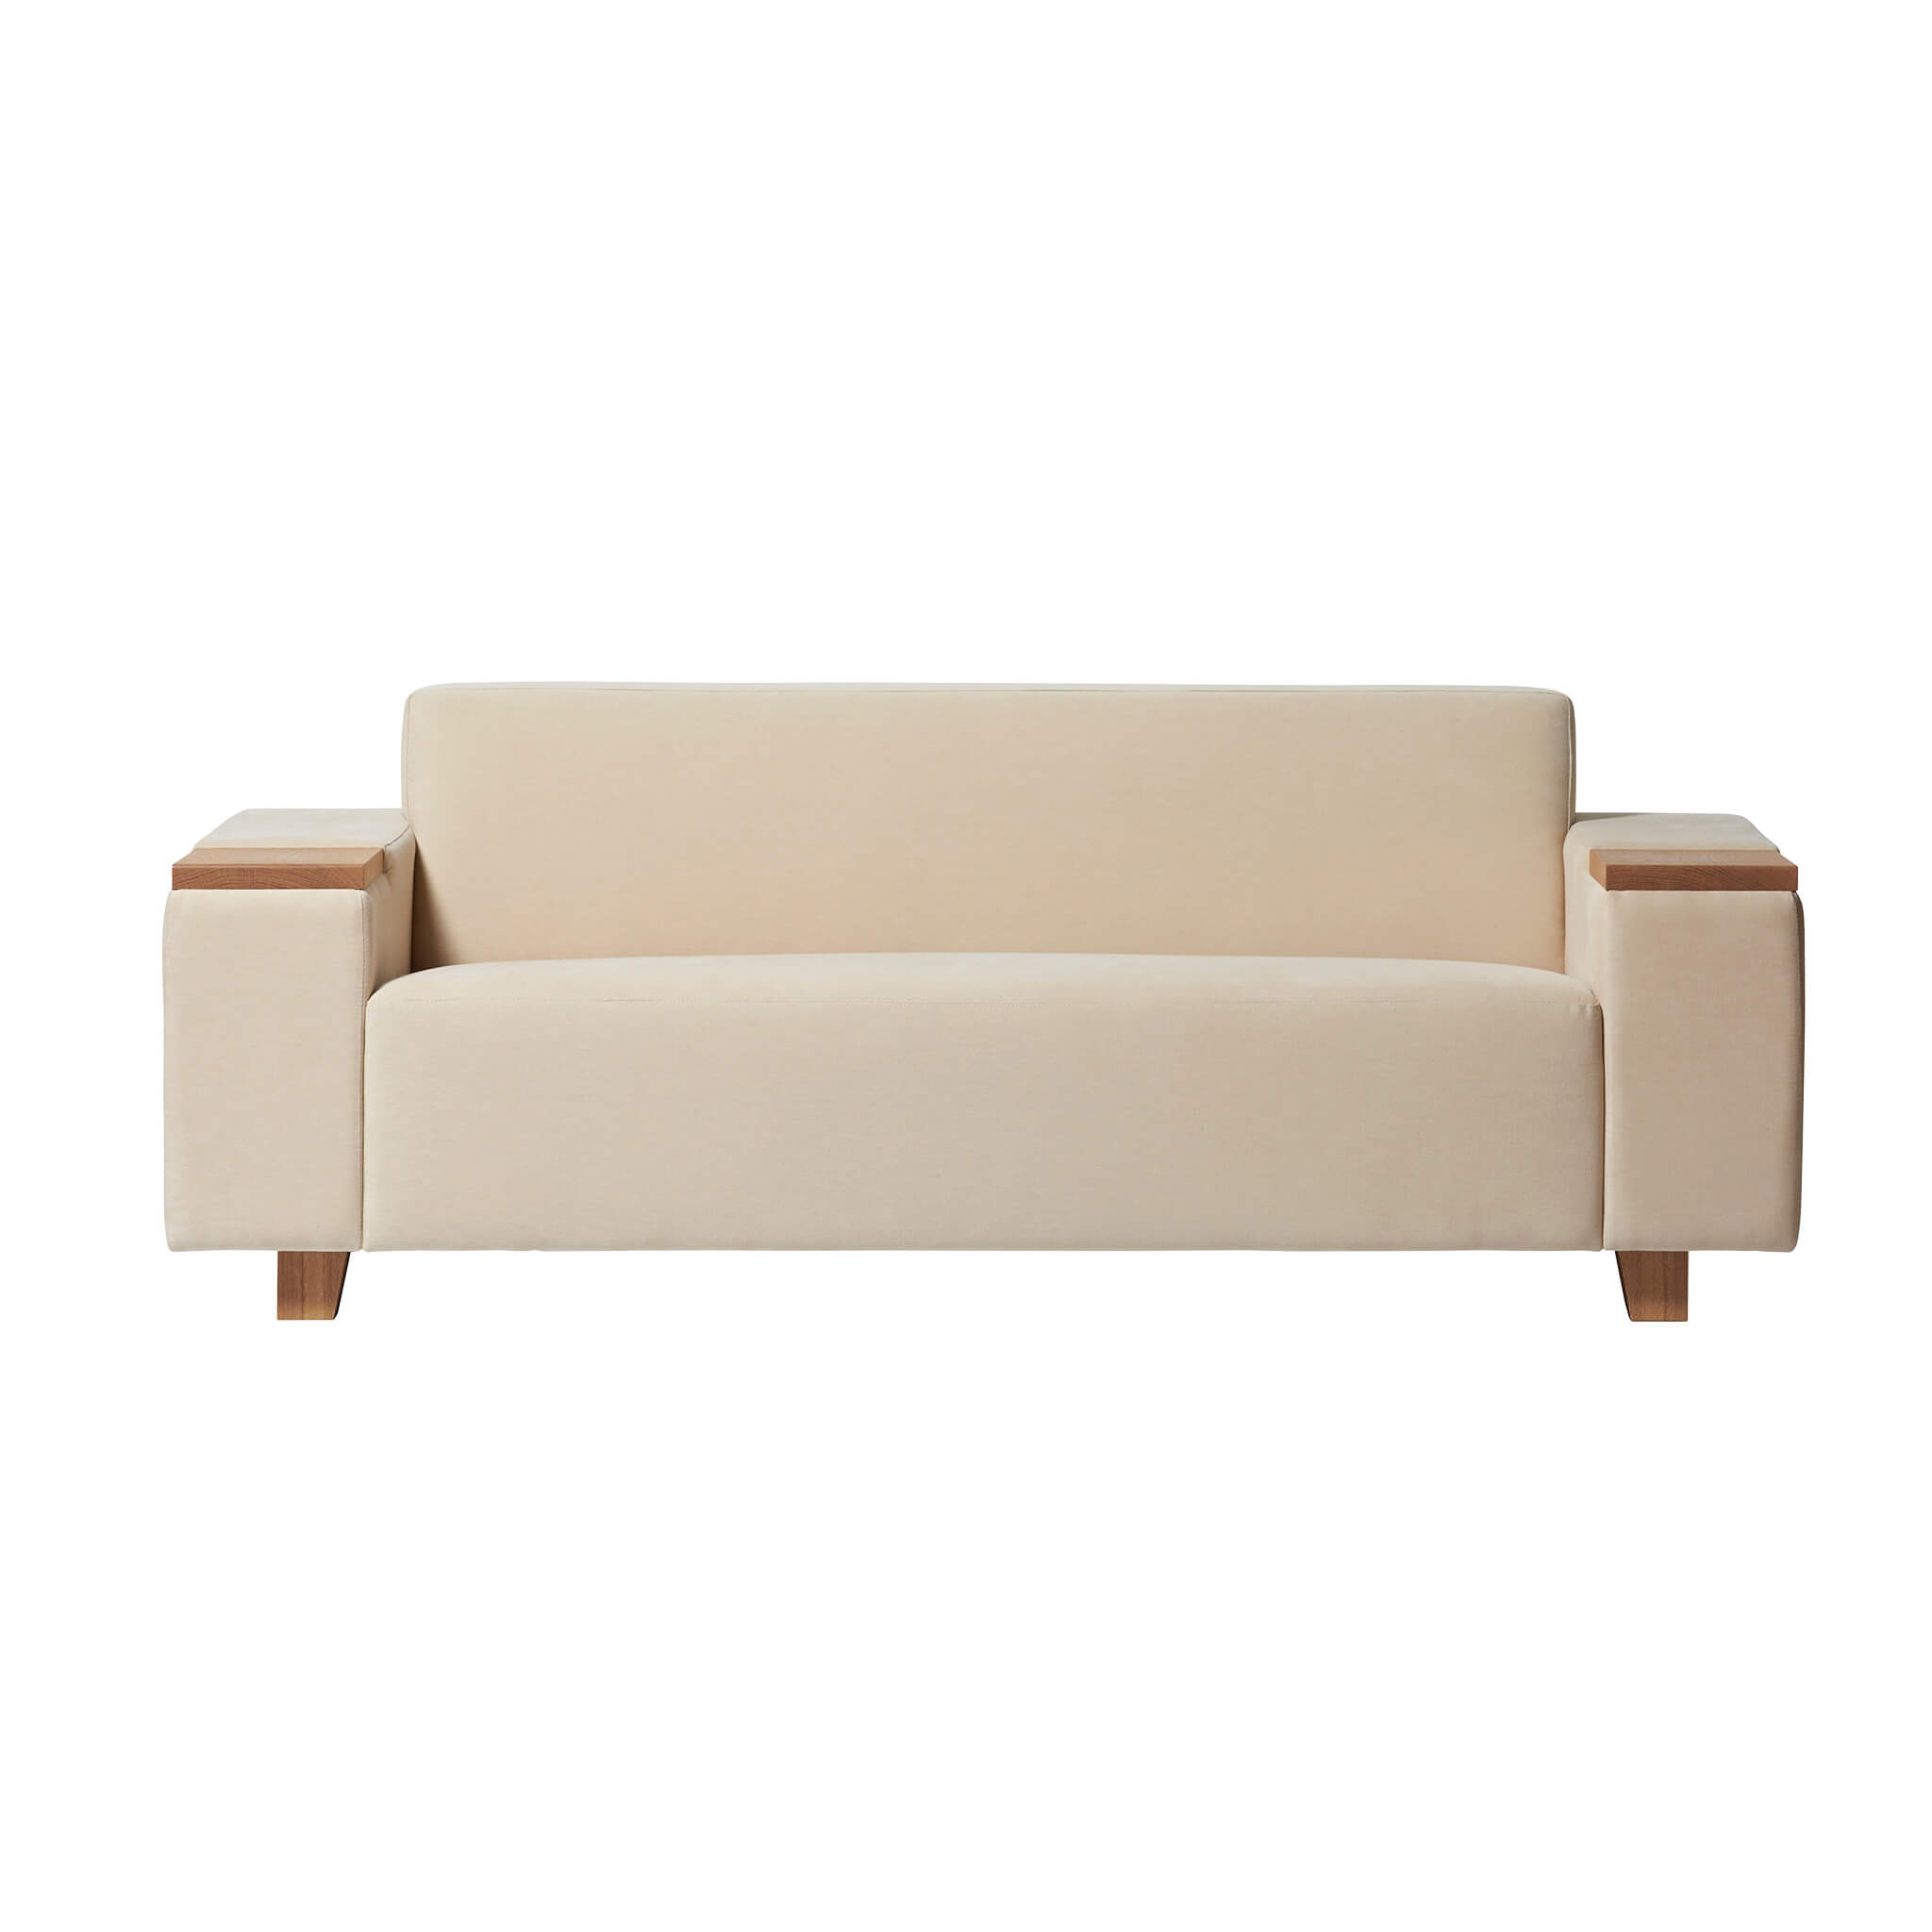 COMBO sofa 2p